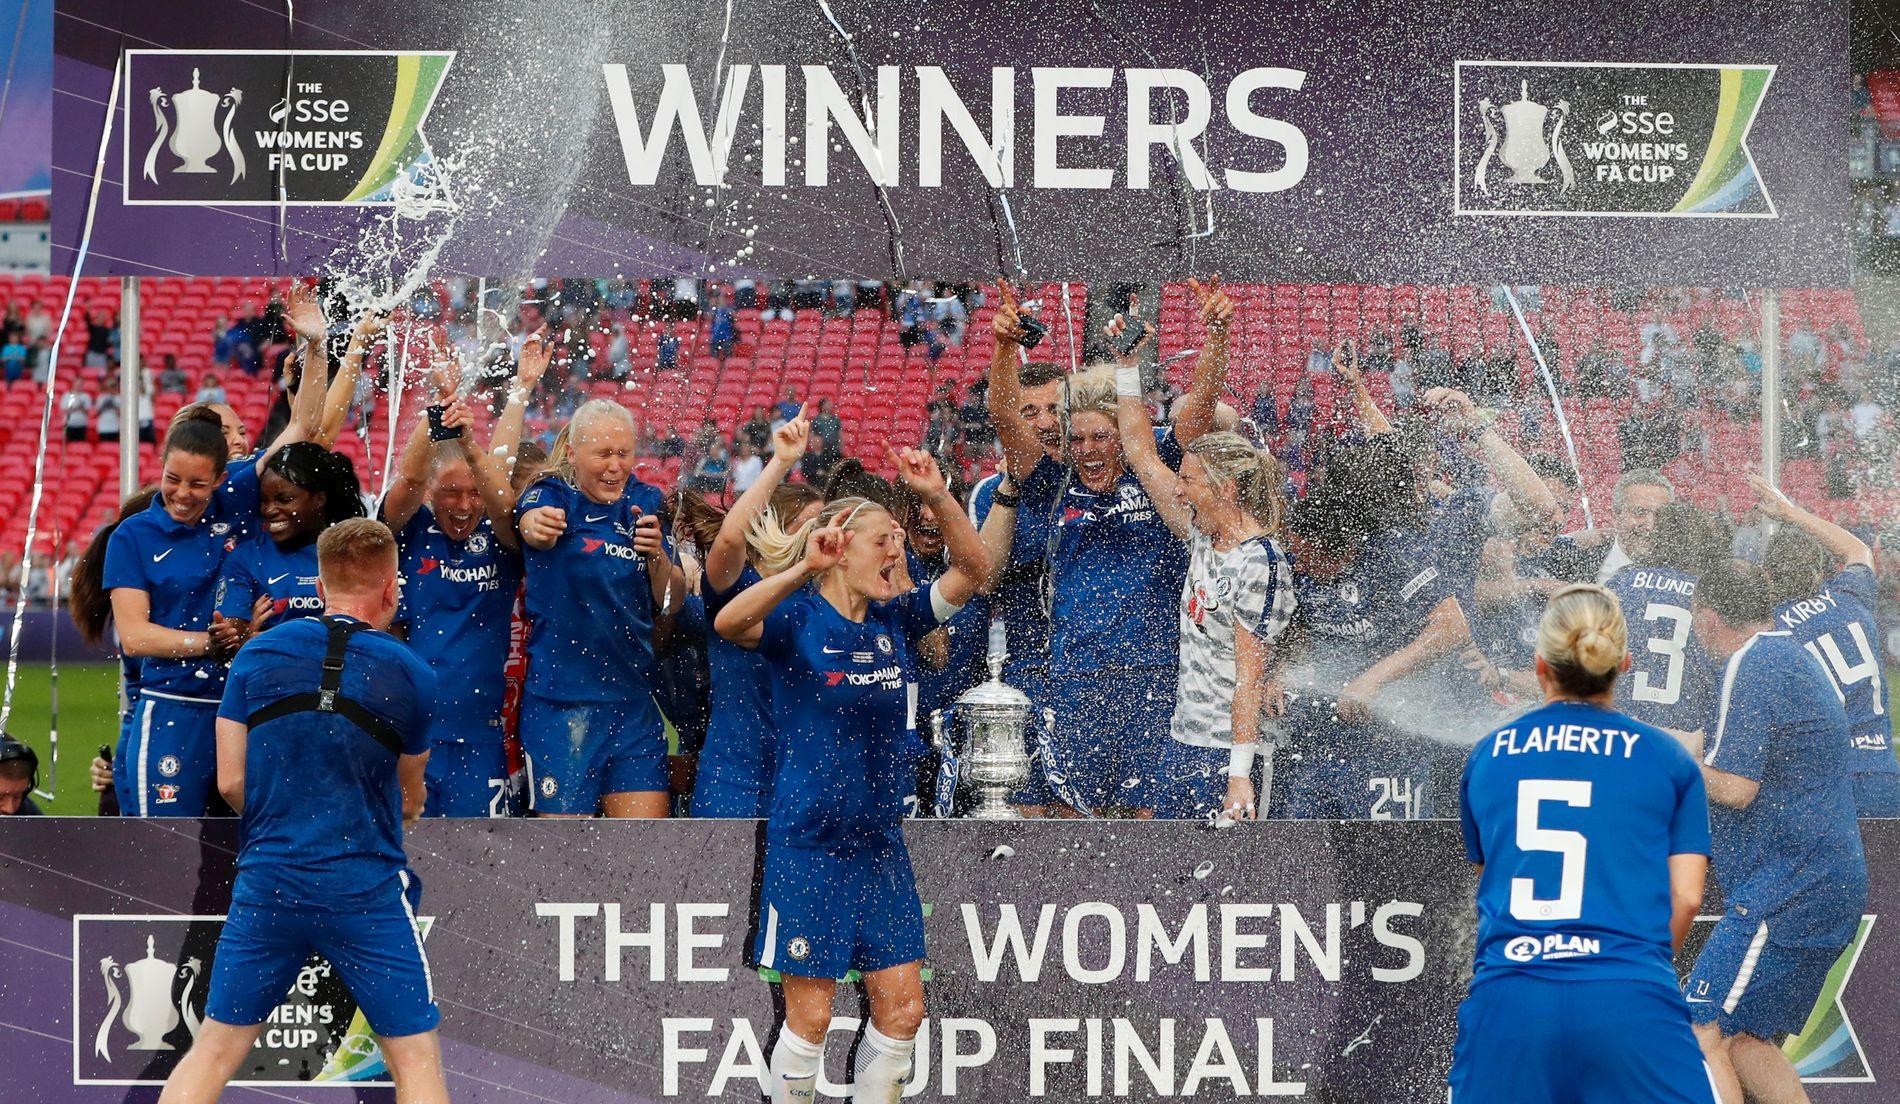 CHAMPAGNE-FEIRING:  Chelsea-spillerne kunne sprette champagnen etter triumfen på Wembley.